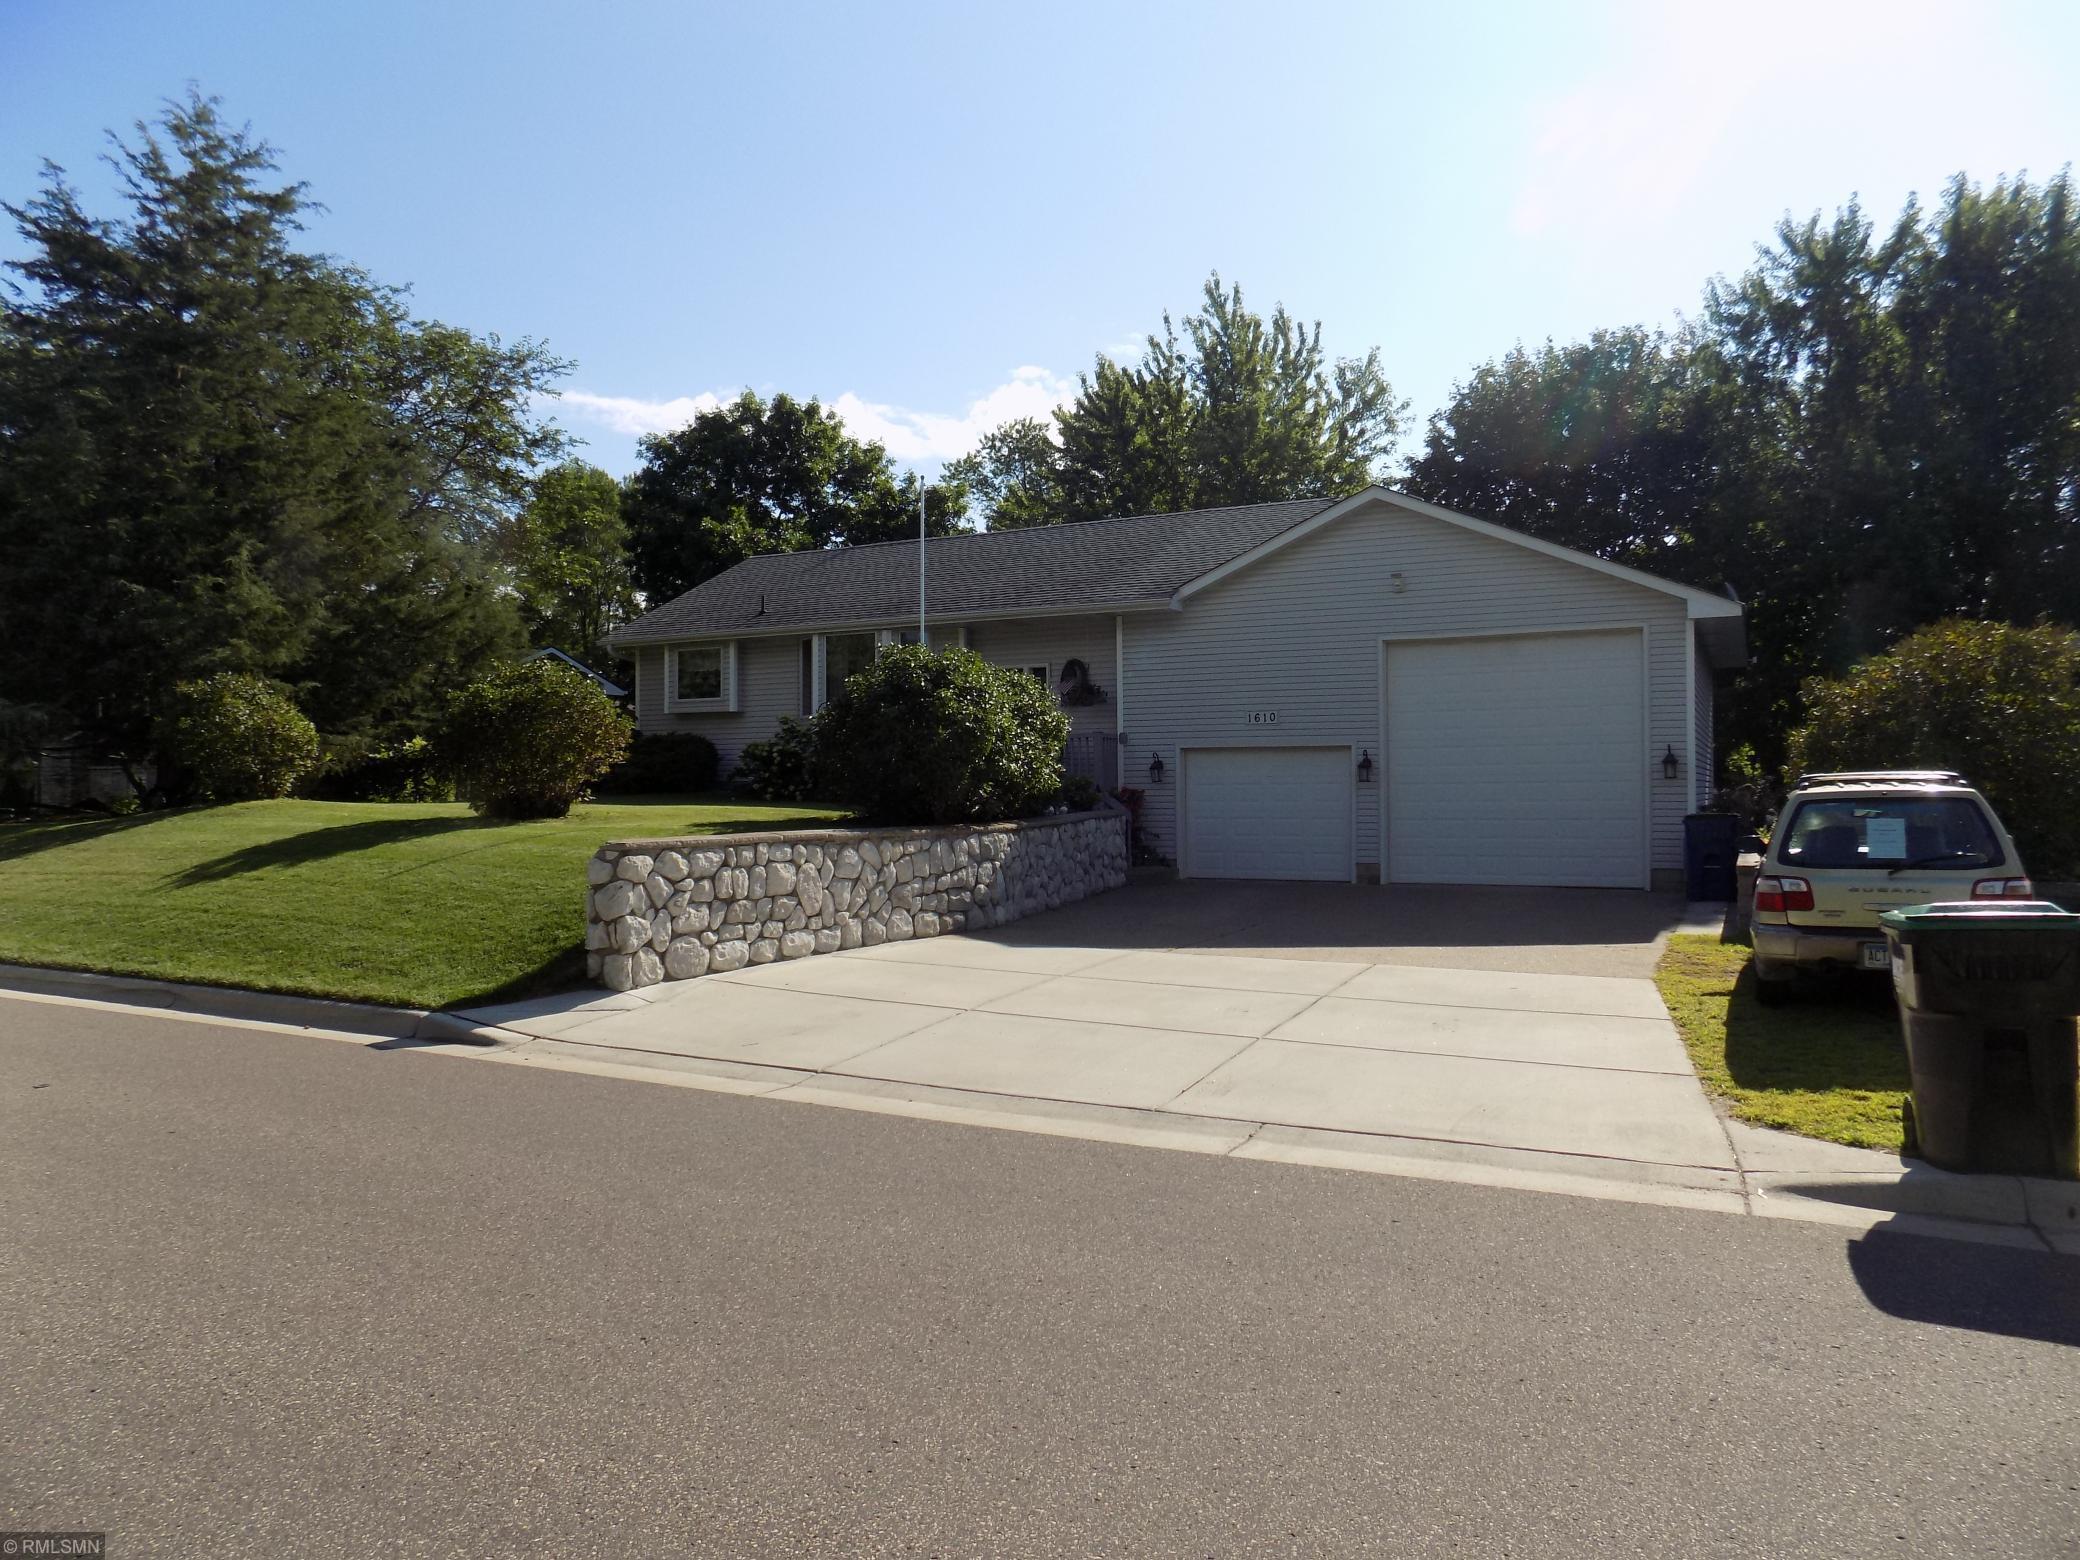 1610 10th Avenue Property Photo - Anoka, MN real estate listing